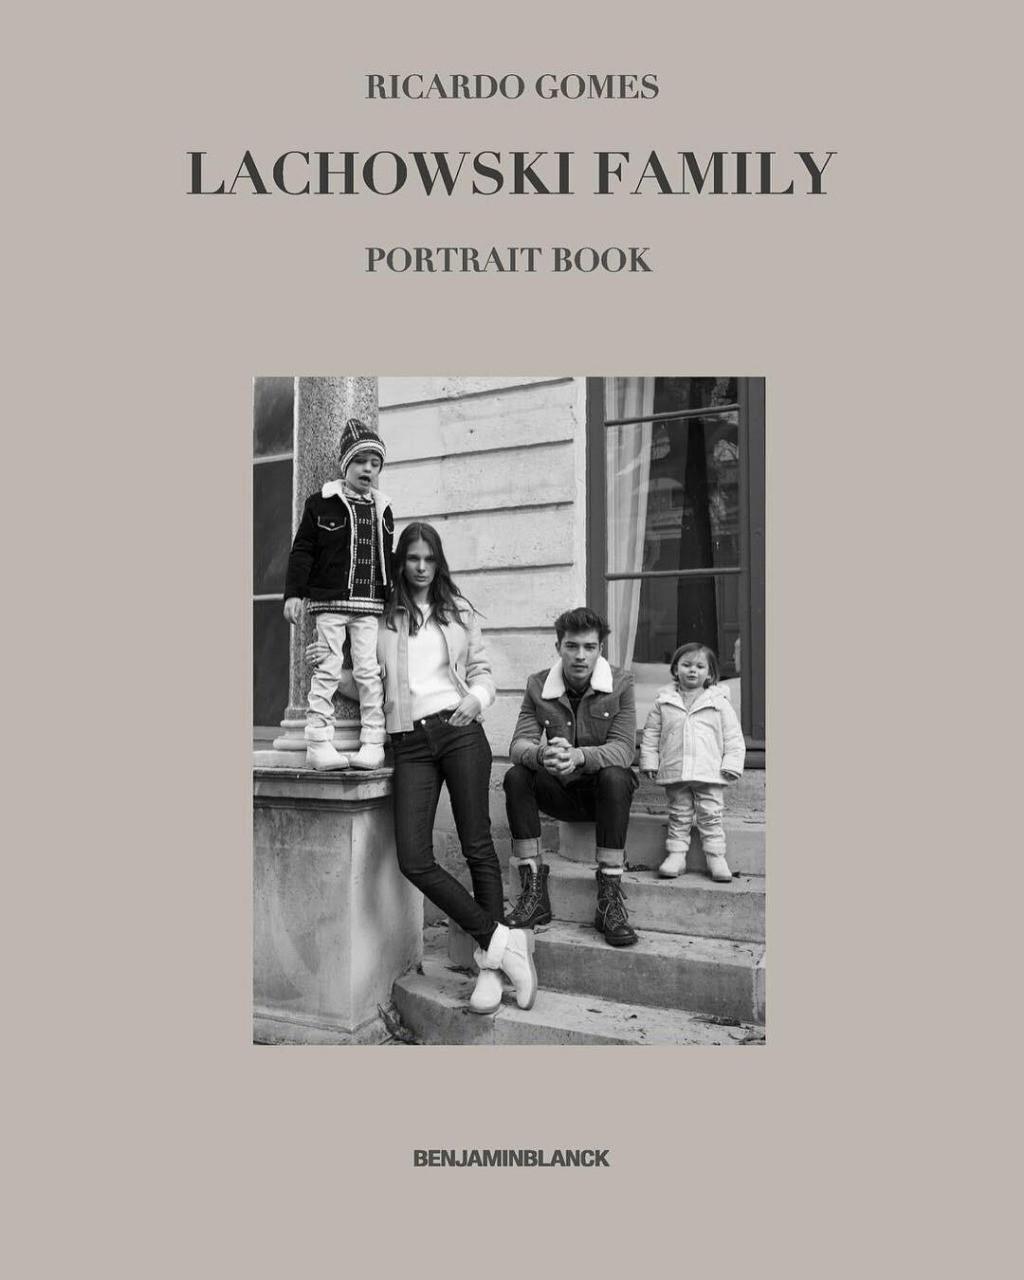 Capa do livro Lachowski Family, de Francisco Lachowski (Foto: Francisco Lachowski / Divulgação)